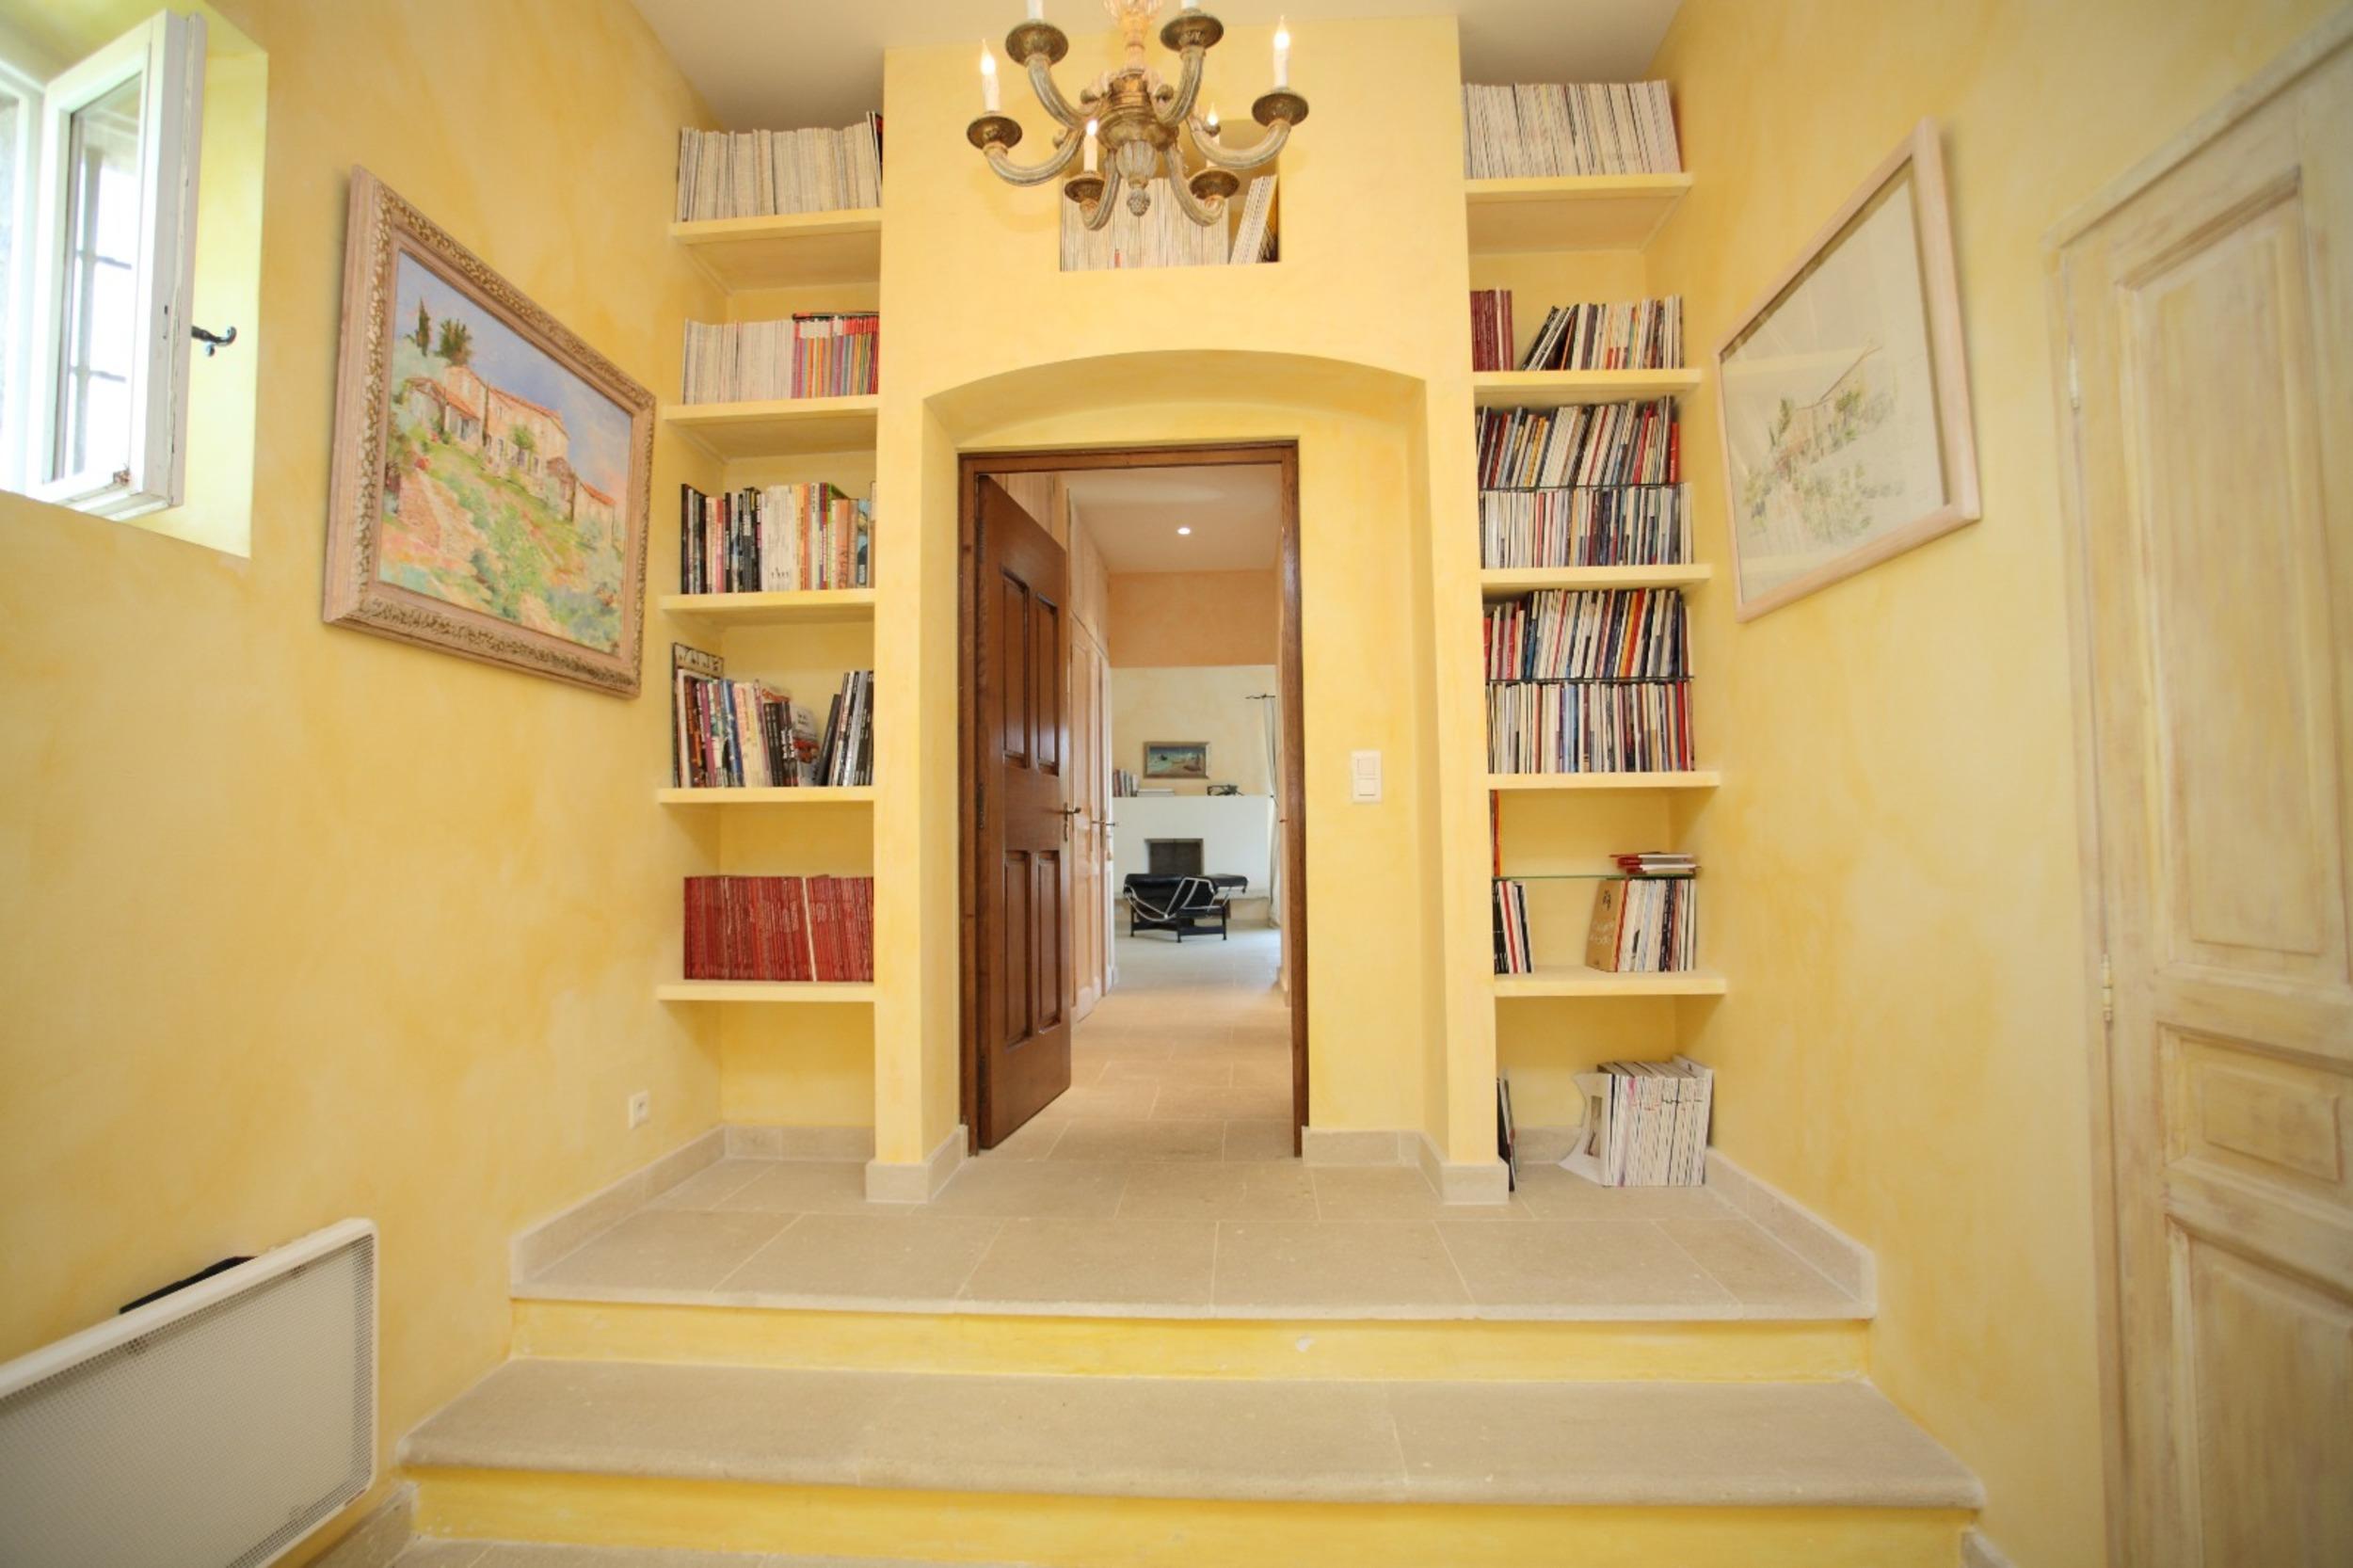 Holiday house Der Fall - Fabelhaftes Landhaus in Gordes (2520443), Gordes, Vaucluse, Provence - Alps - Côte d'Azur, France, picture 13